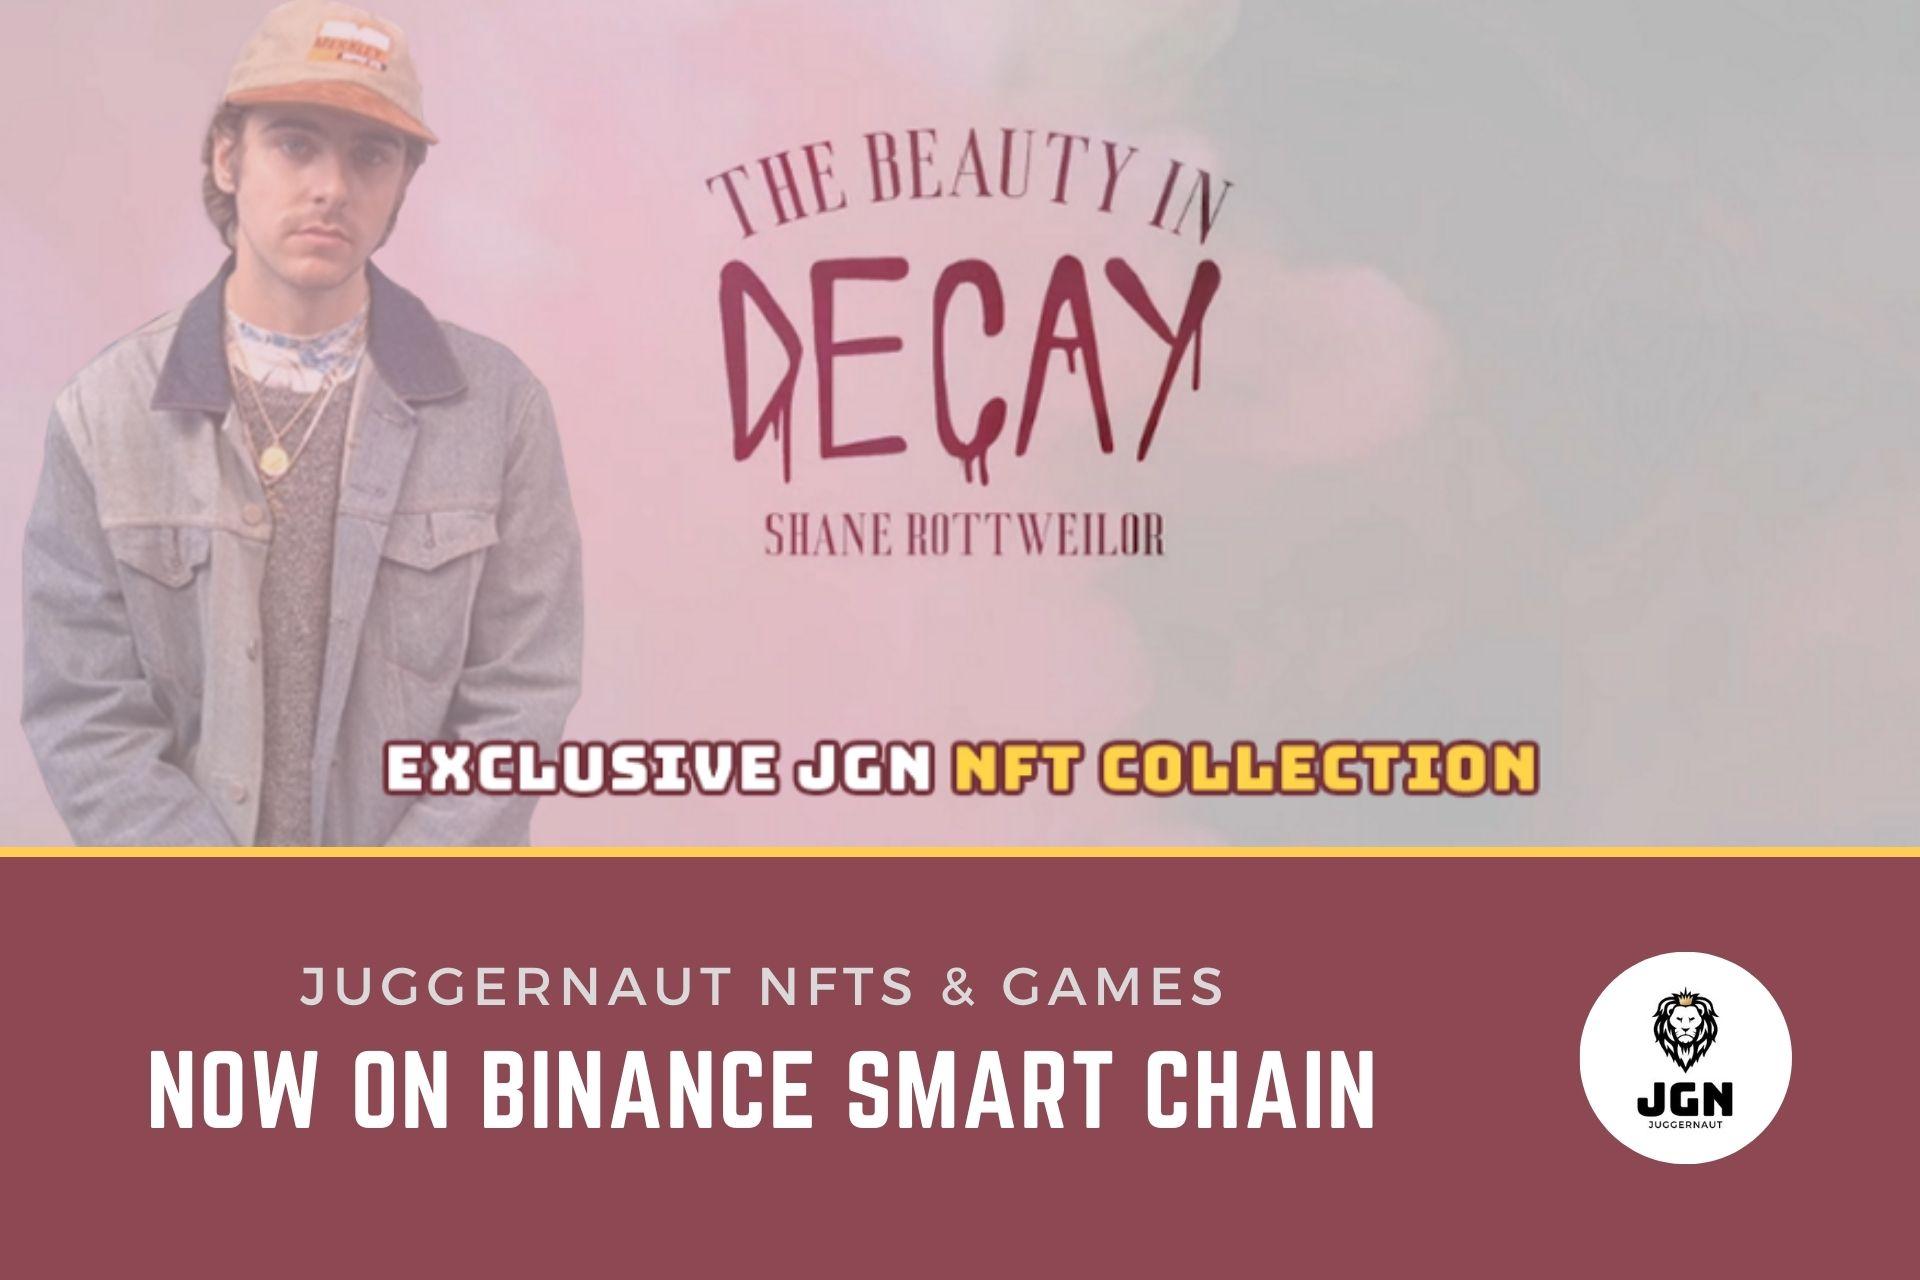 Juggernaut NFTs & Games Now on Binance Smart Chain (BSC)